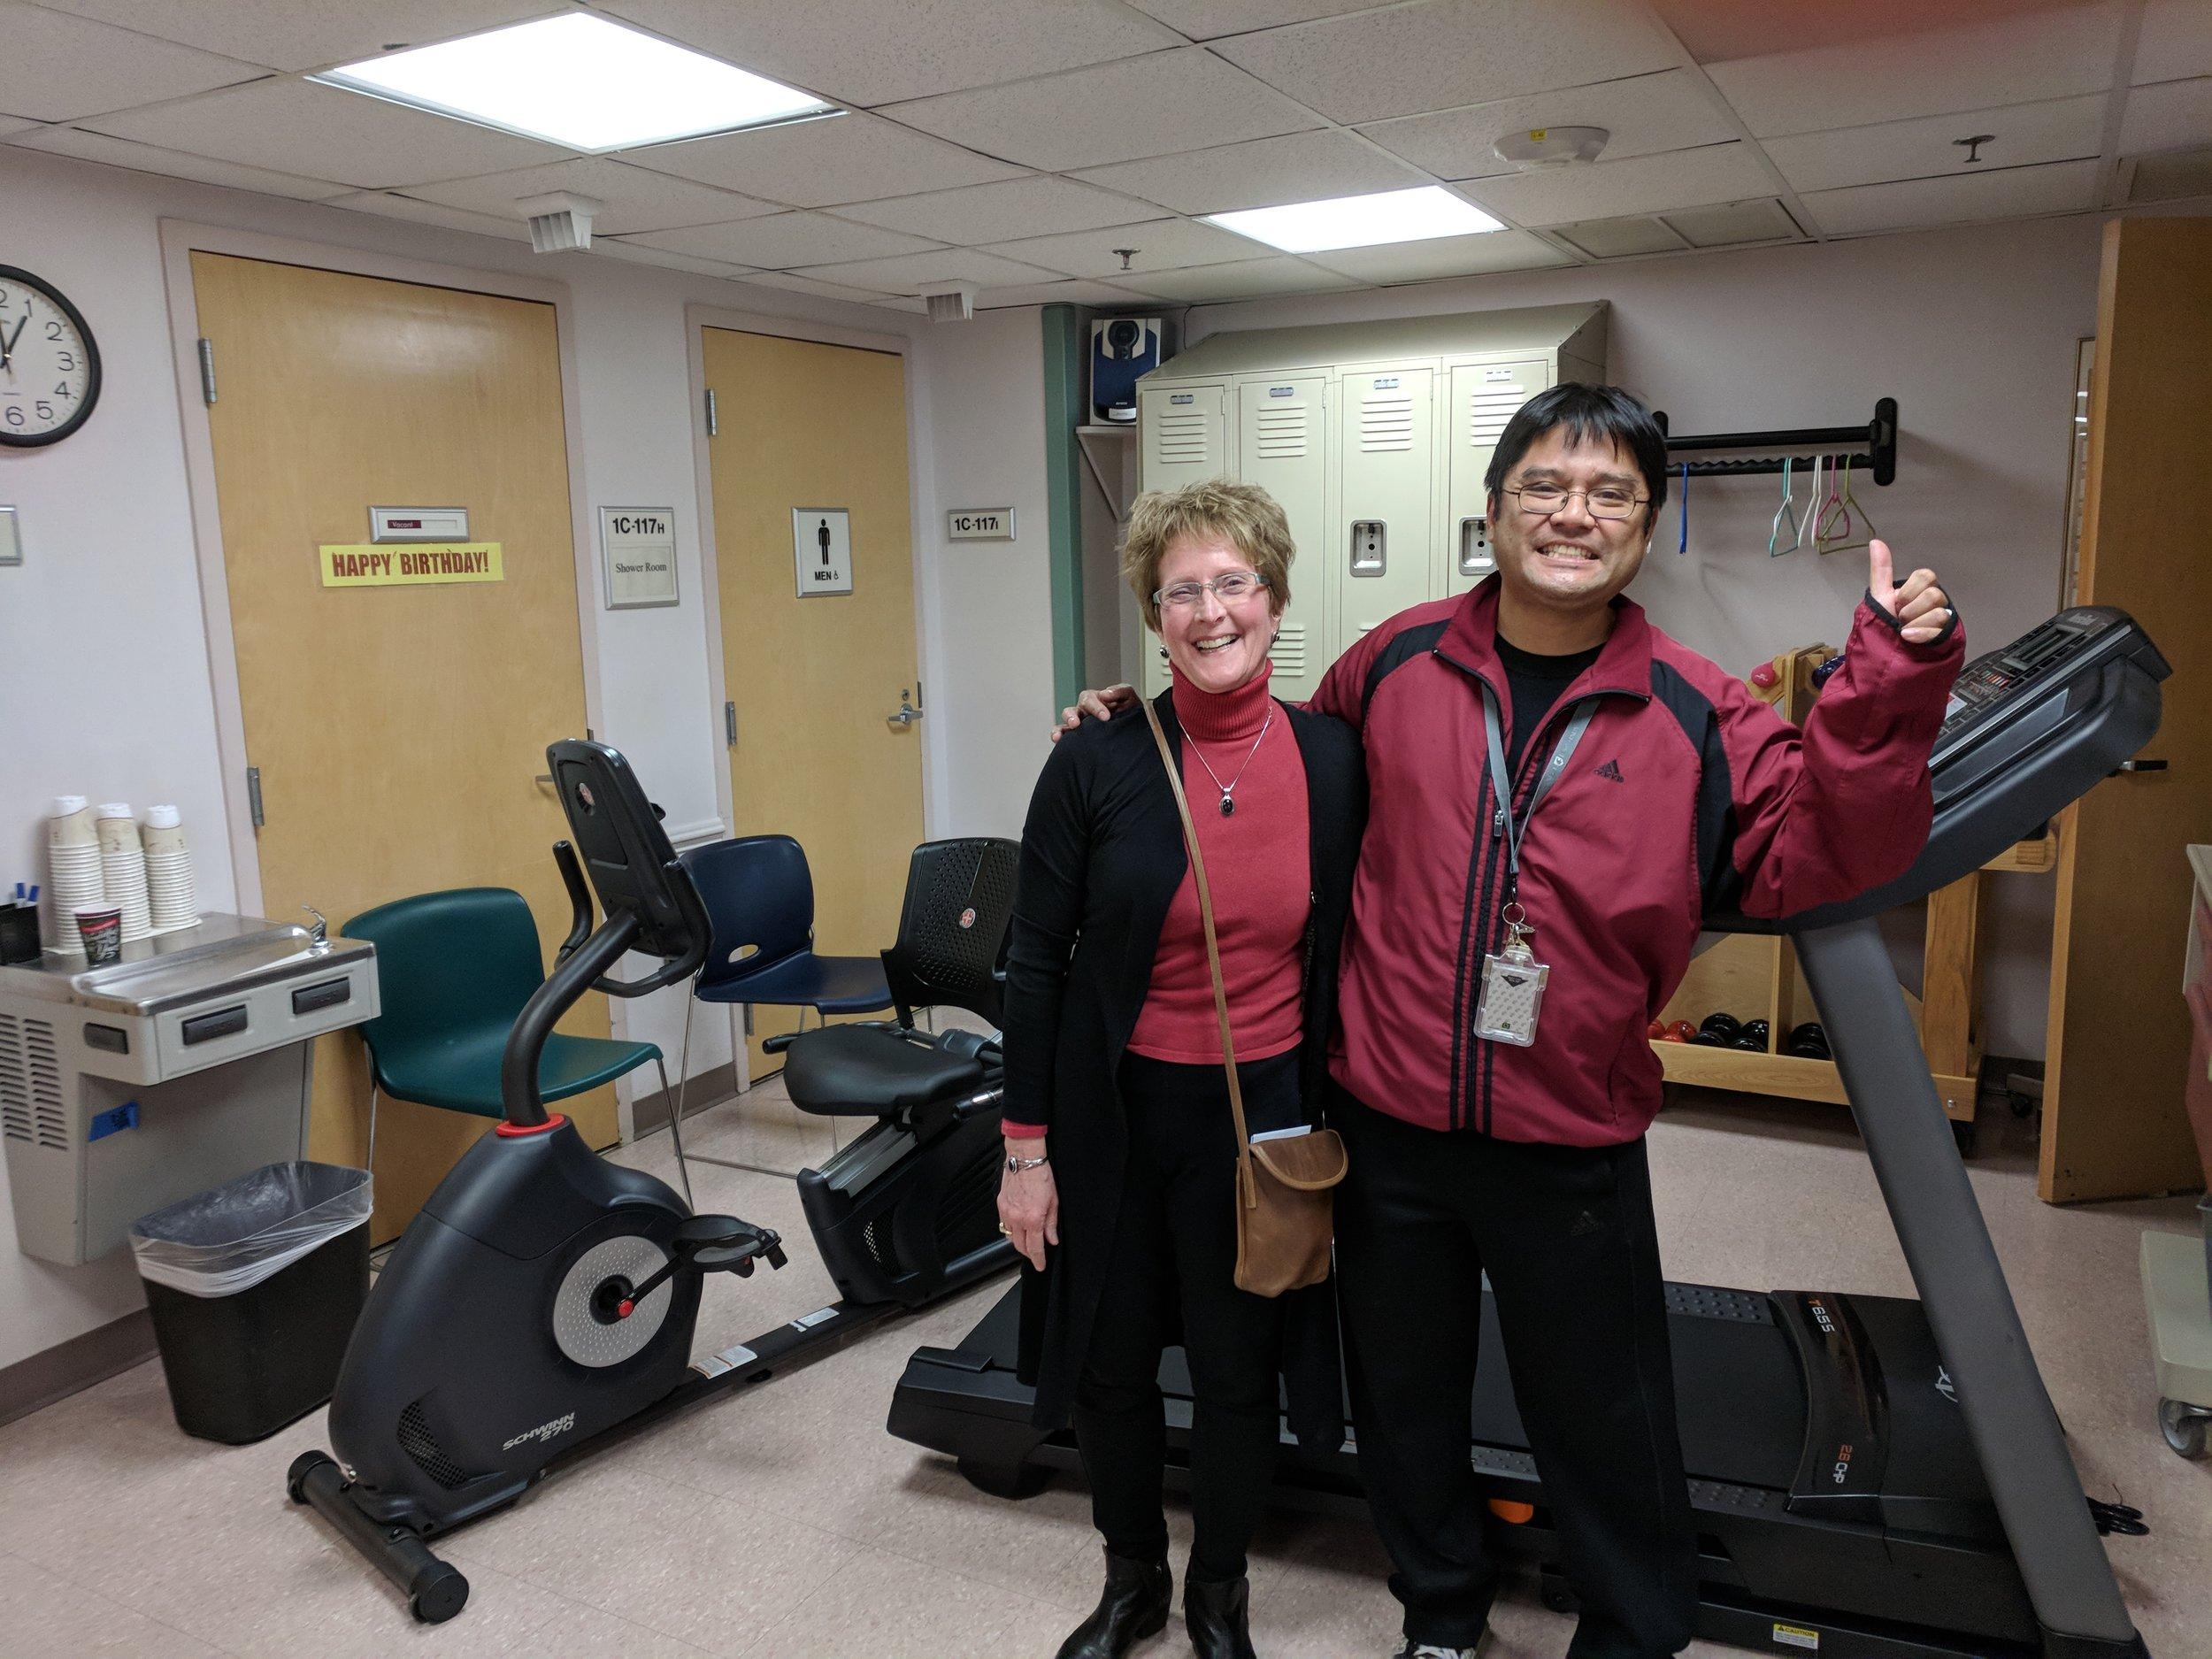 UVS volunteer Laura Balun & a VA nurse alongside the new equipment